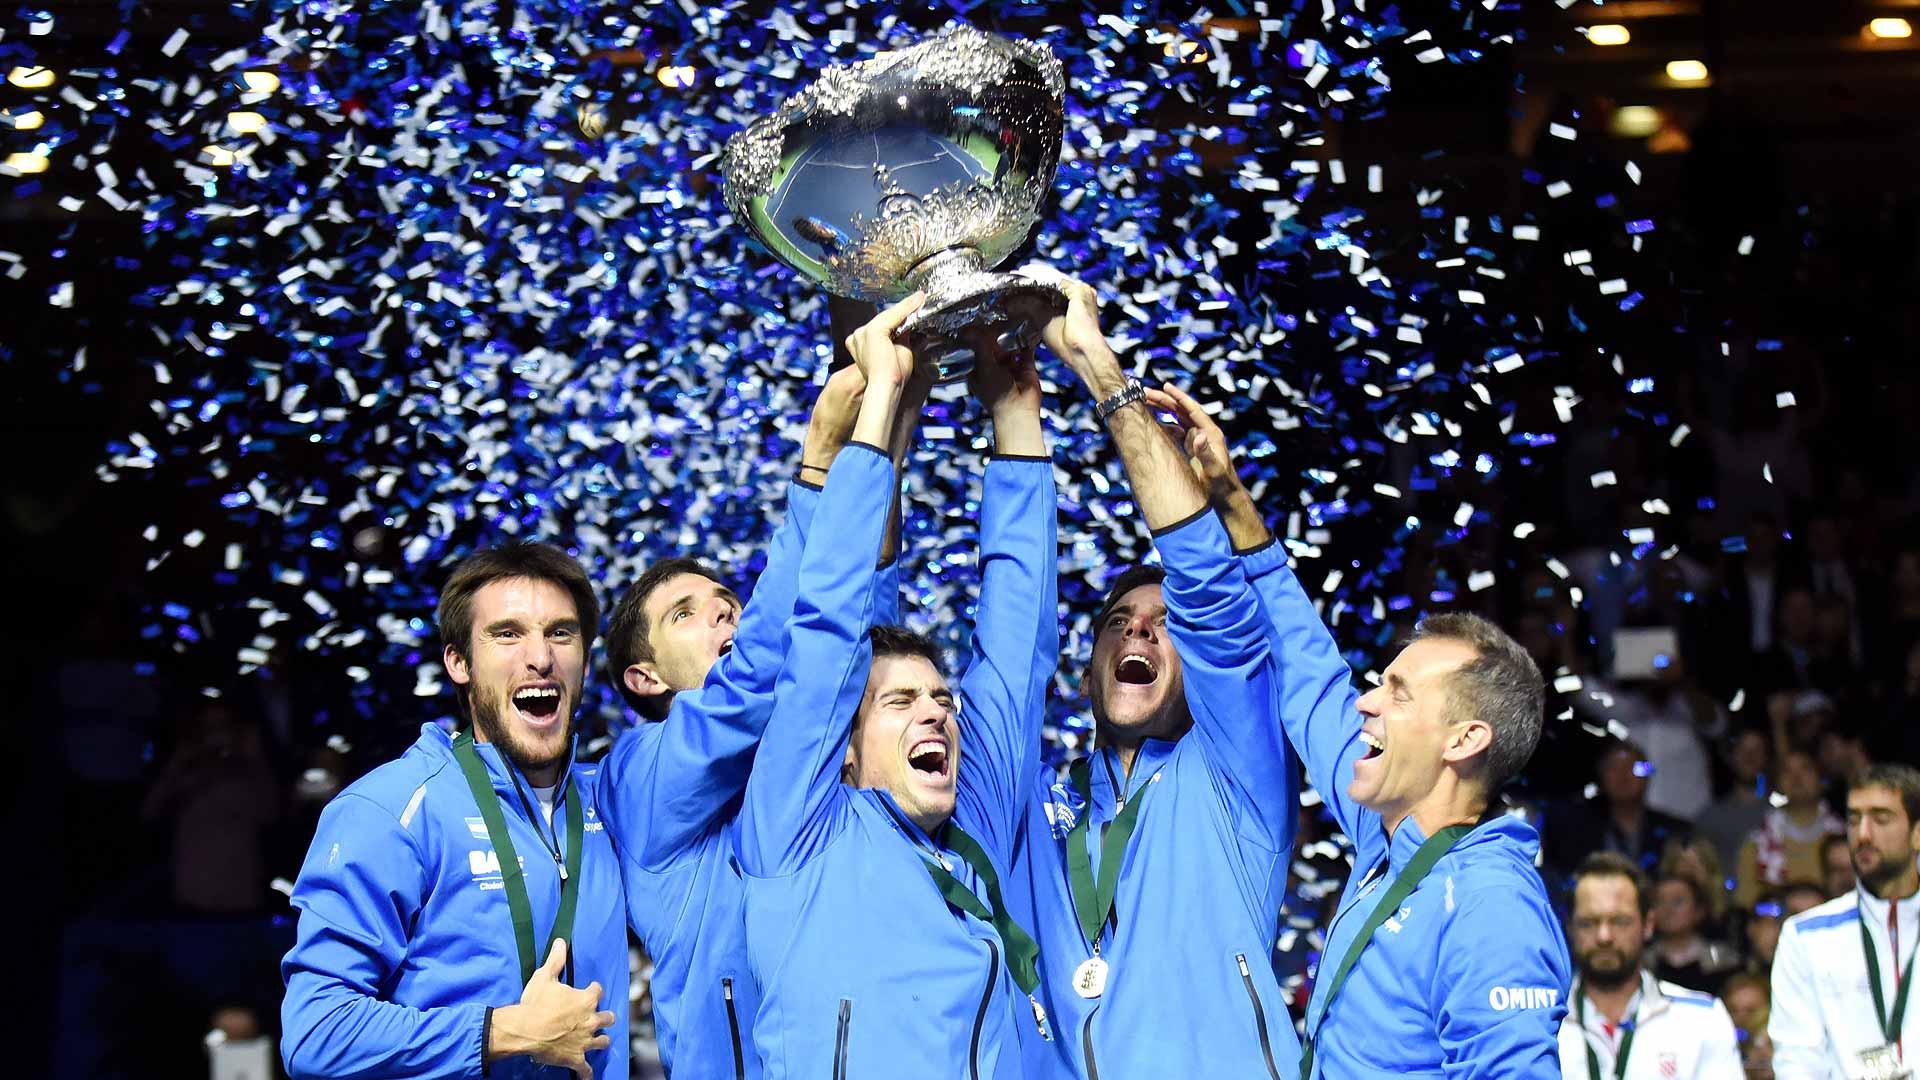 davis-cup-final-2016-trophy.jpg